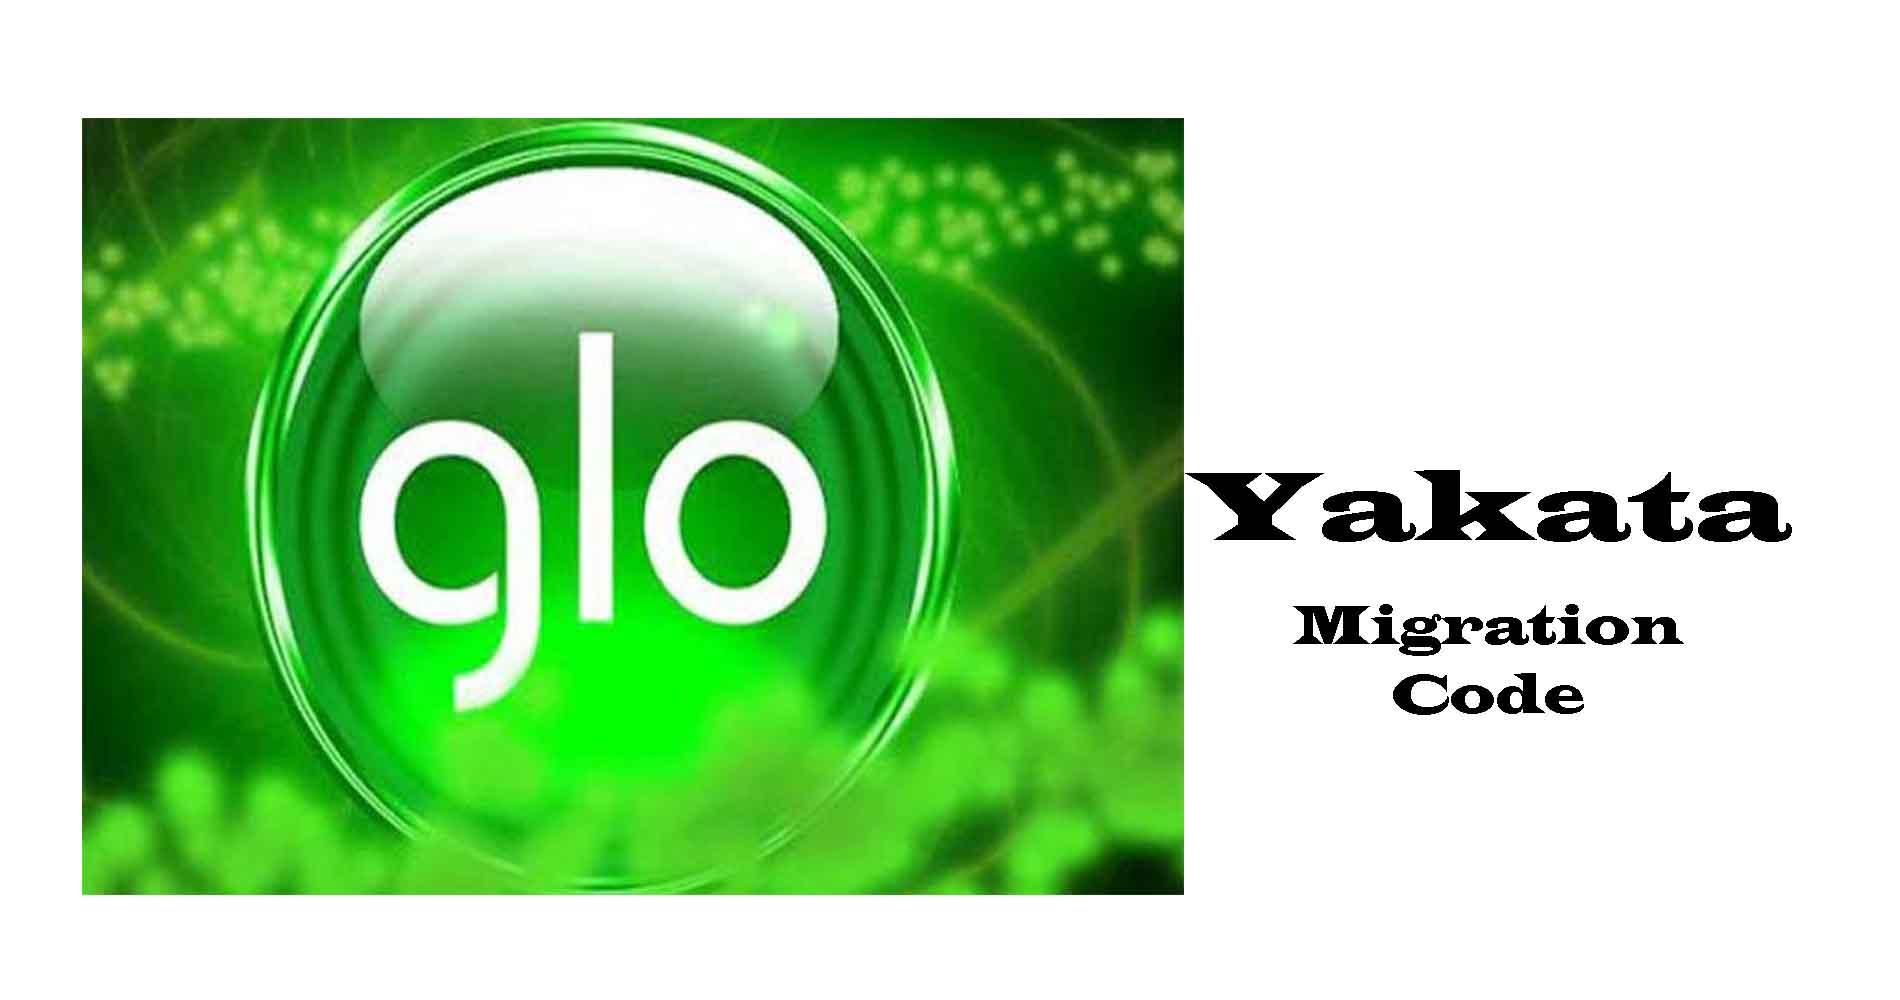 Glo Yakata: How to Subscribe , Benefits and Check Bonus Balance